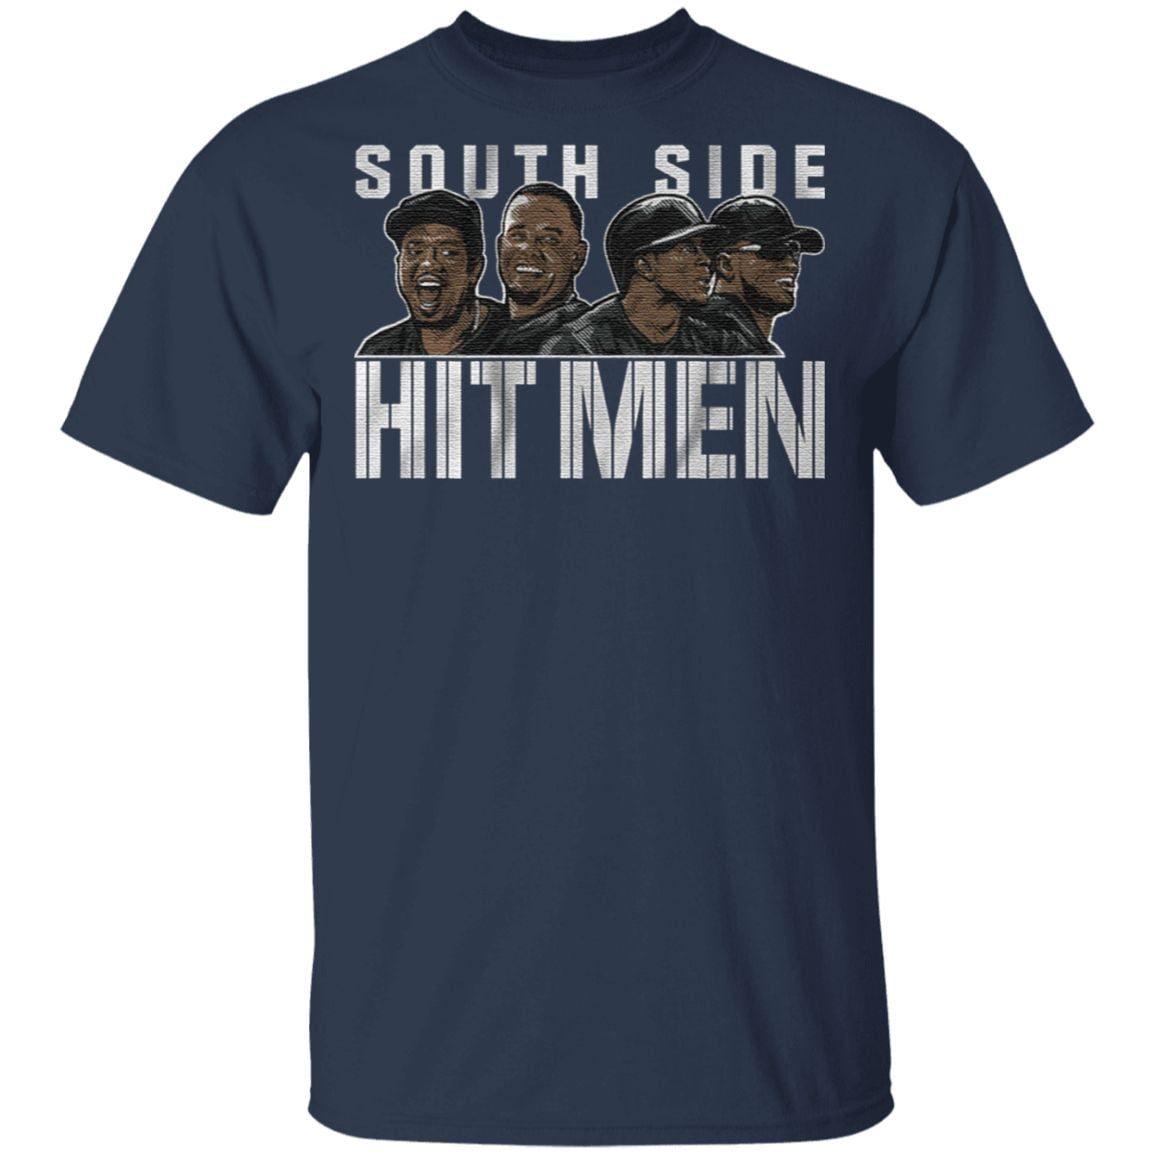 south side hit men t shirt